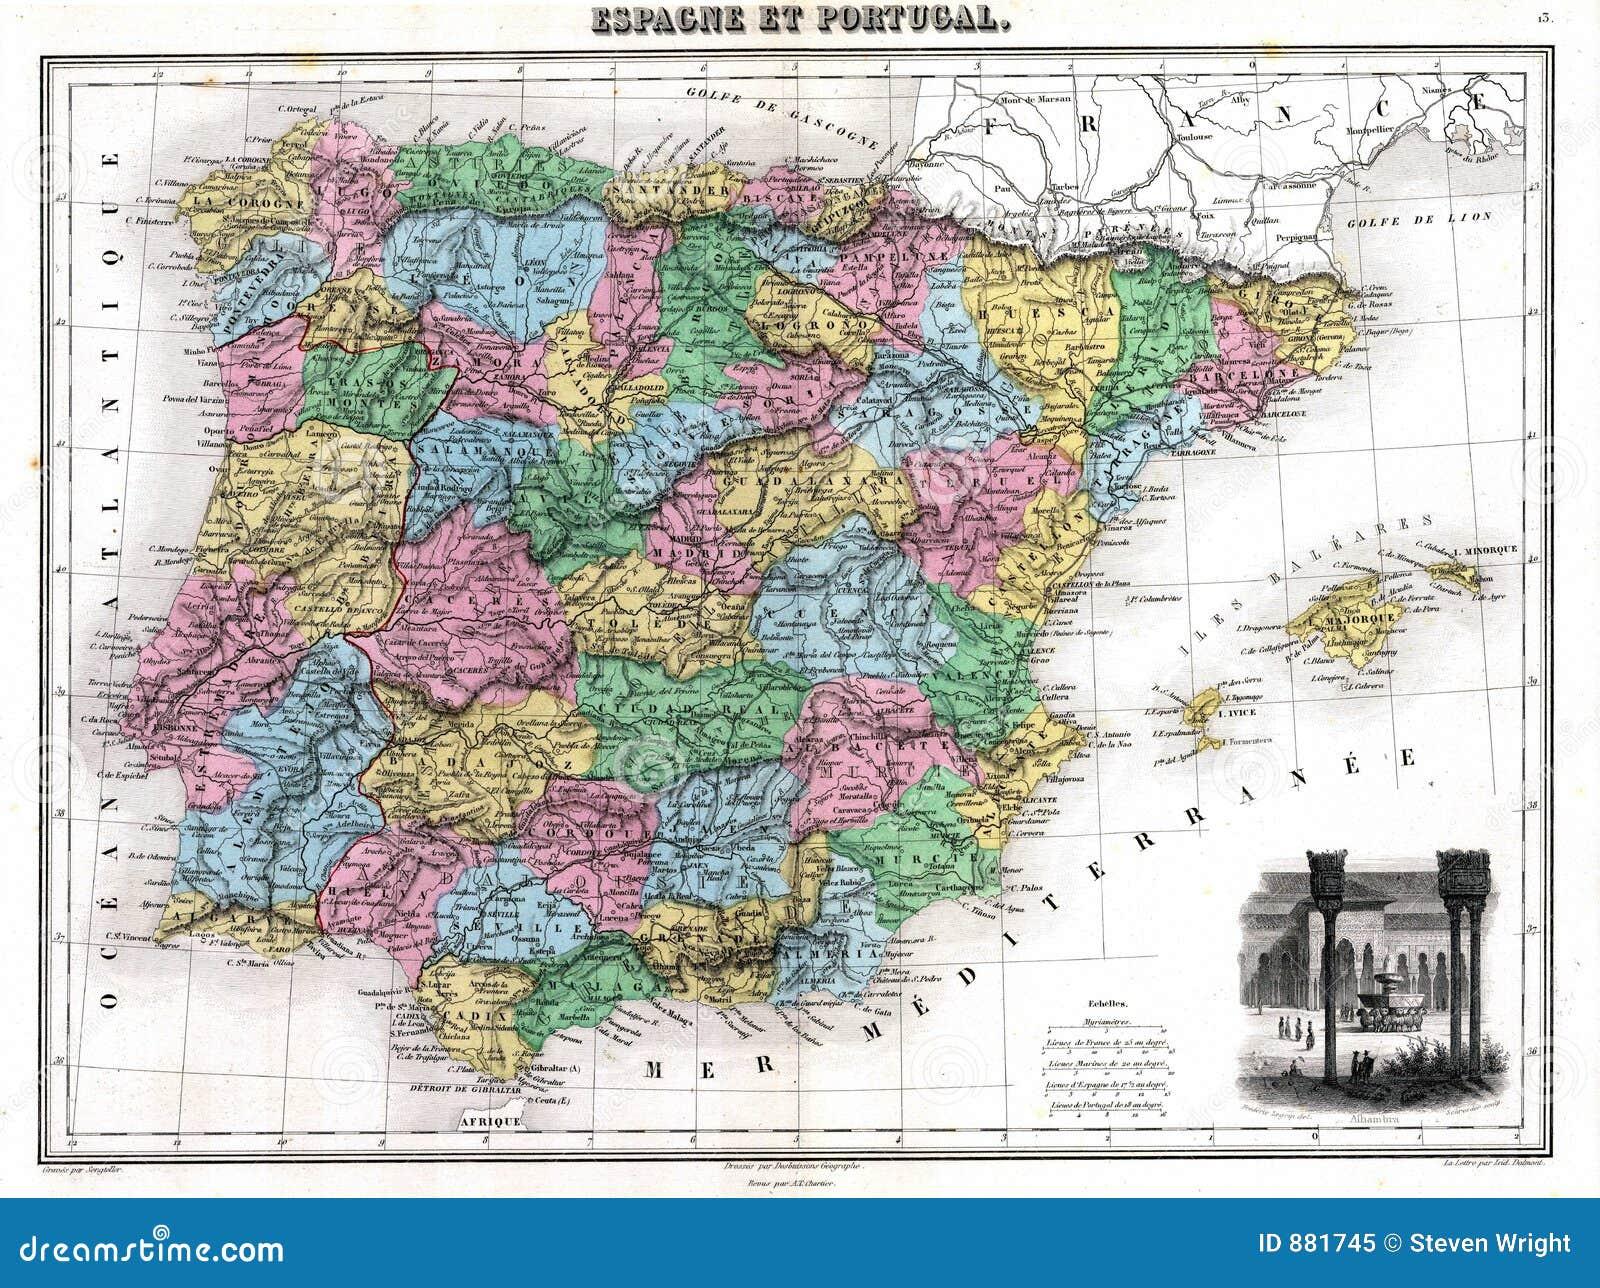 1870 mapy o Portugal Hiszpanii